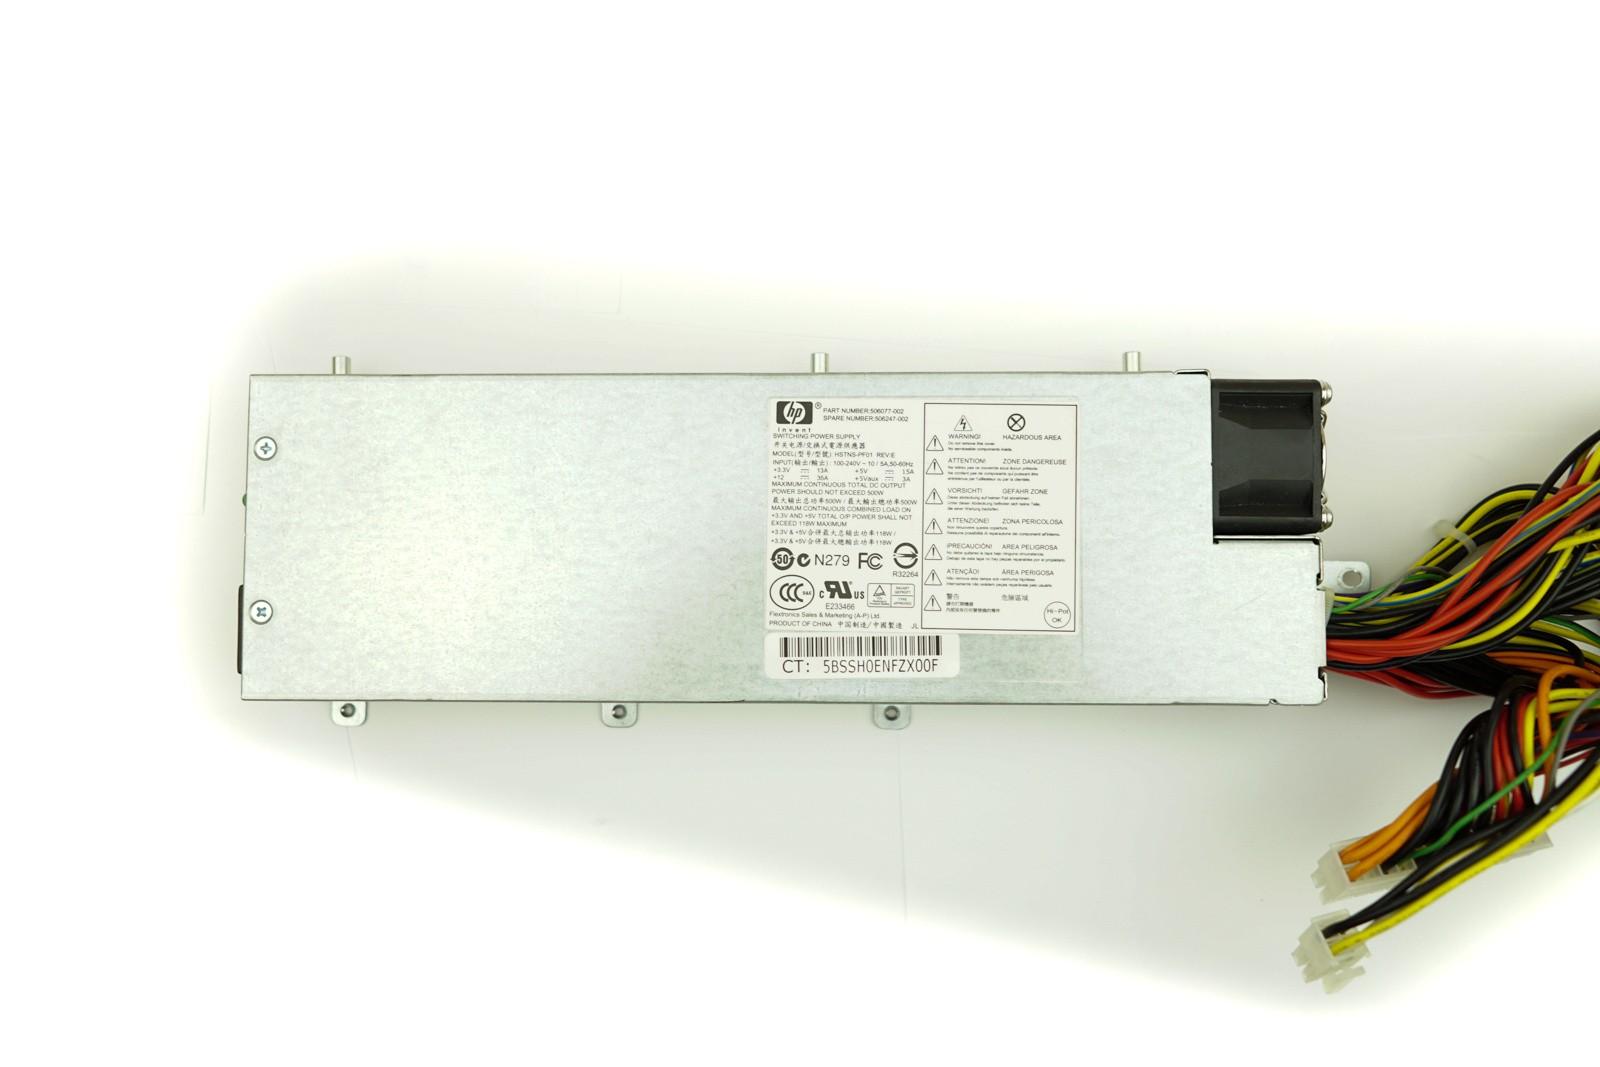 DL320 G6 WINDOWS 8 DRIVERS DOWNLOAD (2019)